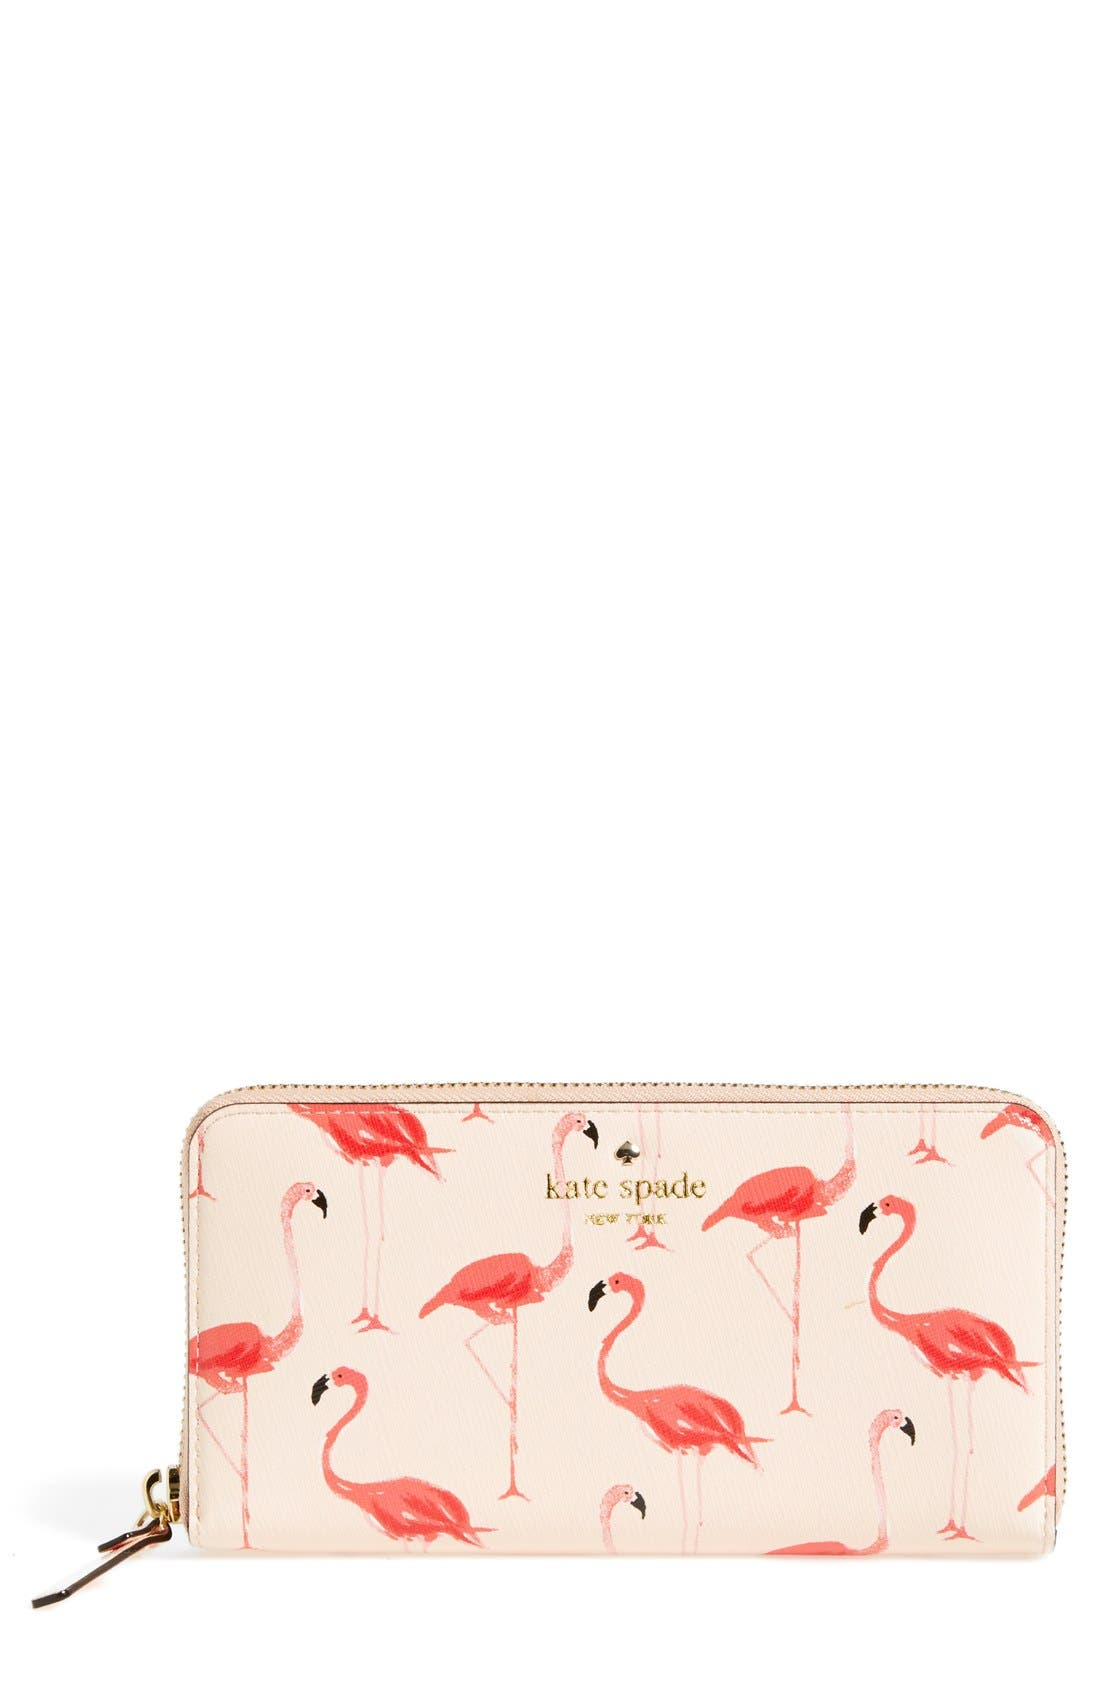 kate spade 'cedar street - lacey' zip wallet,                             Main thumbnail 1, color,                             191